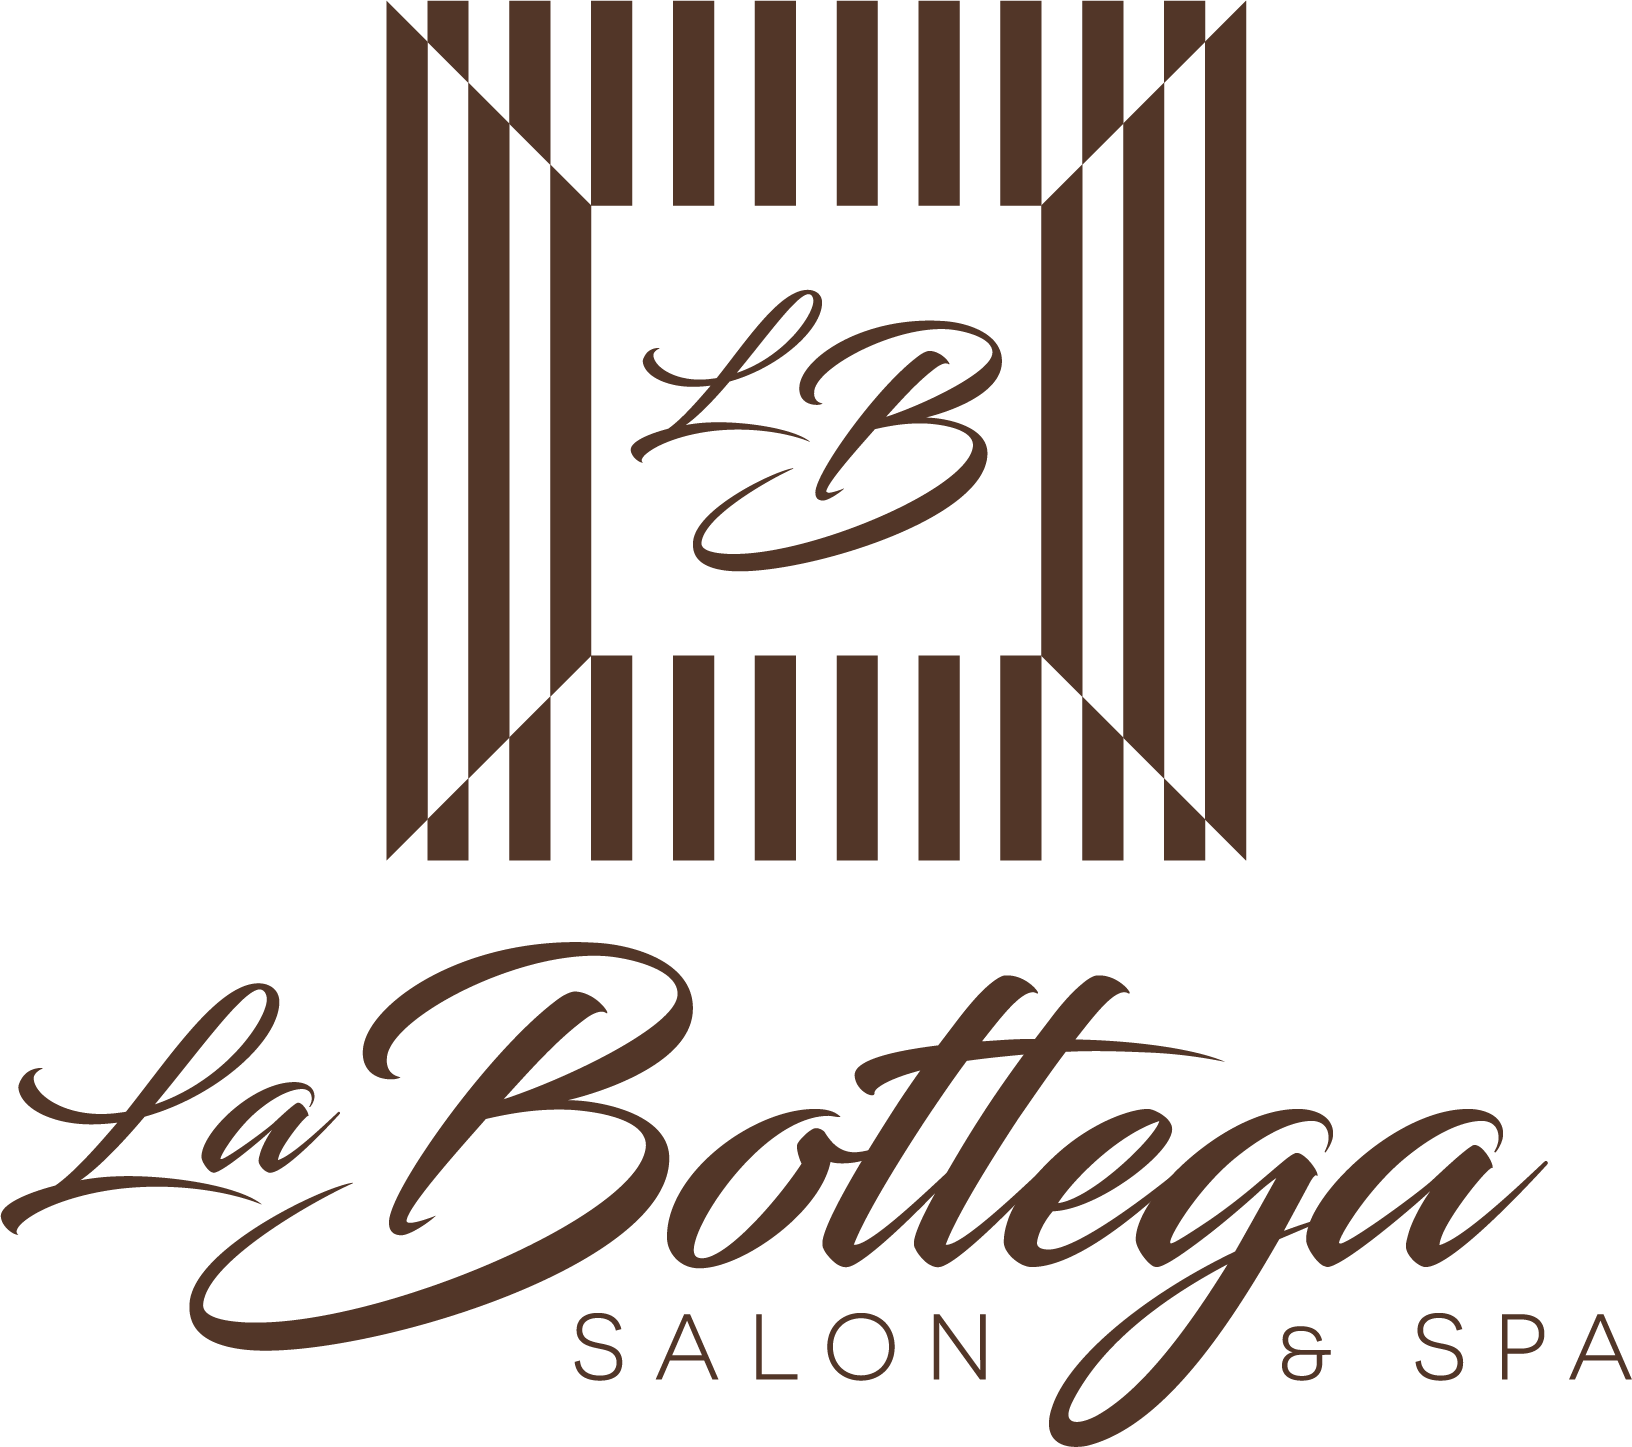 LaBottegaSalonSpa_Pantone.png